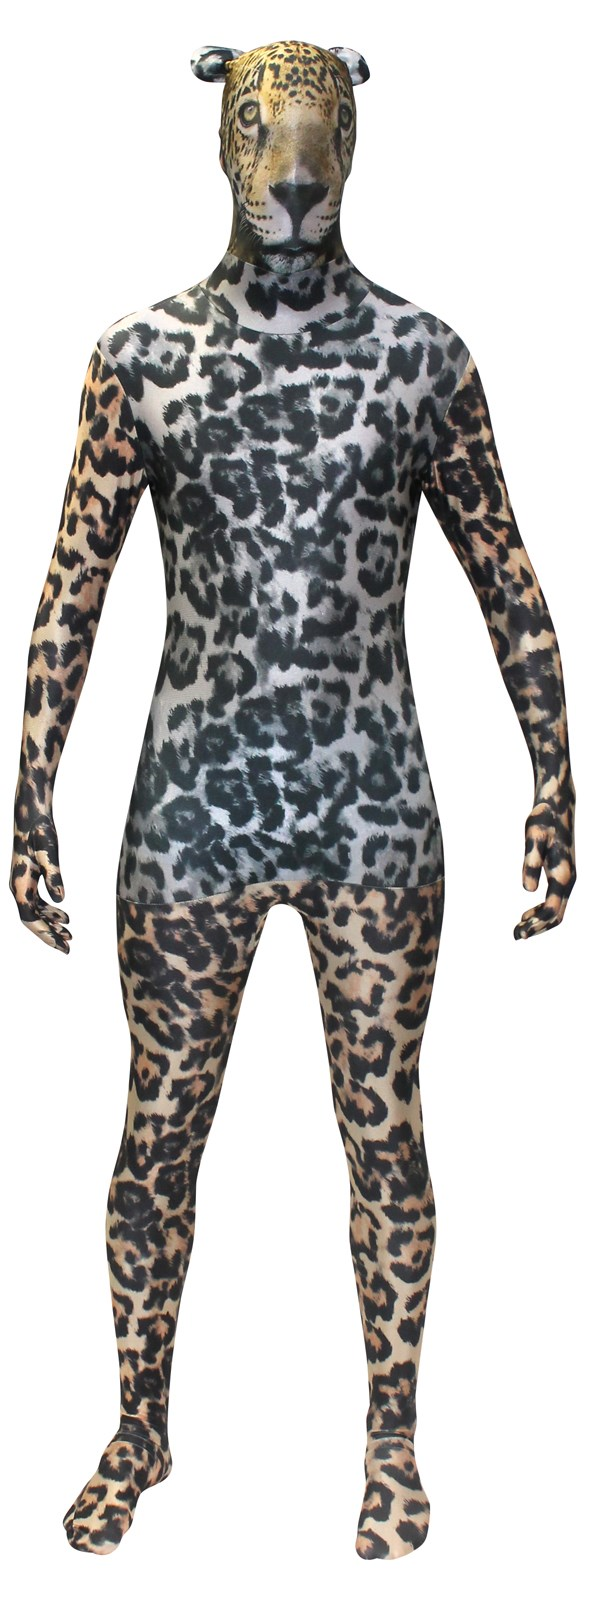 Image of Animal Planet - Jaguar Morphsuit